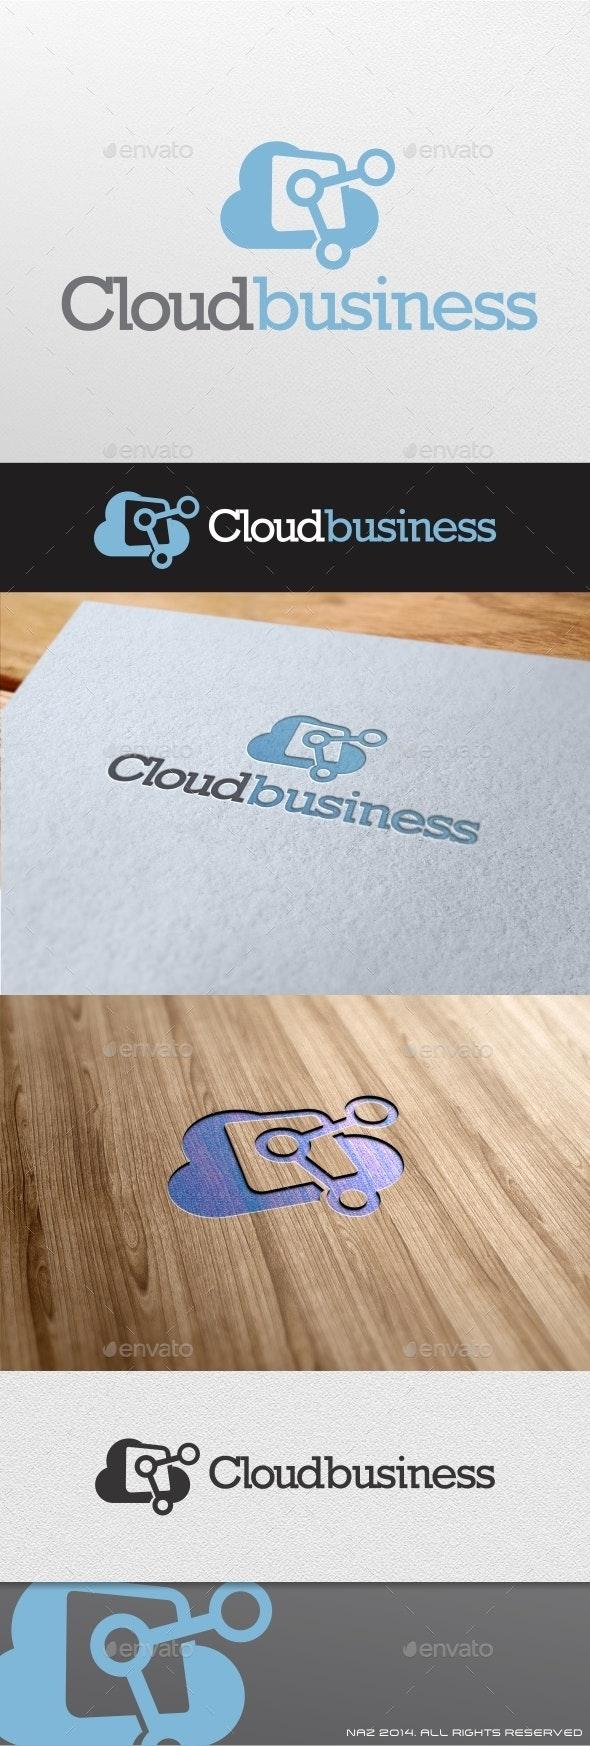 Cloud Business Logo - Objects Logo Templates